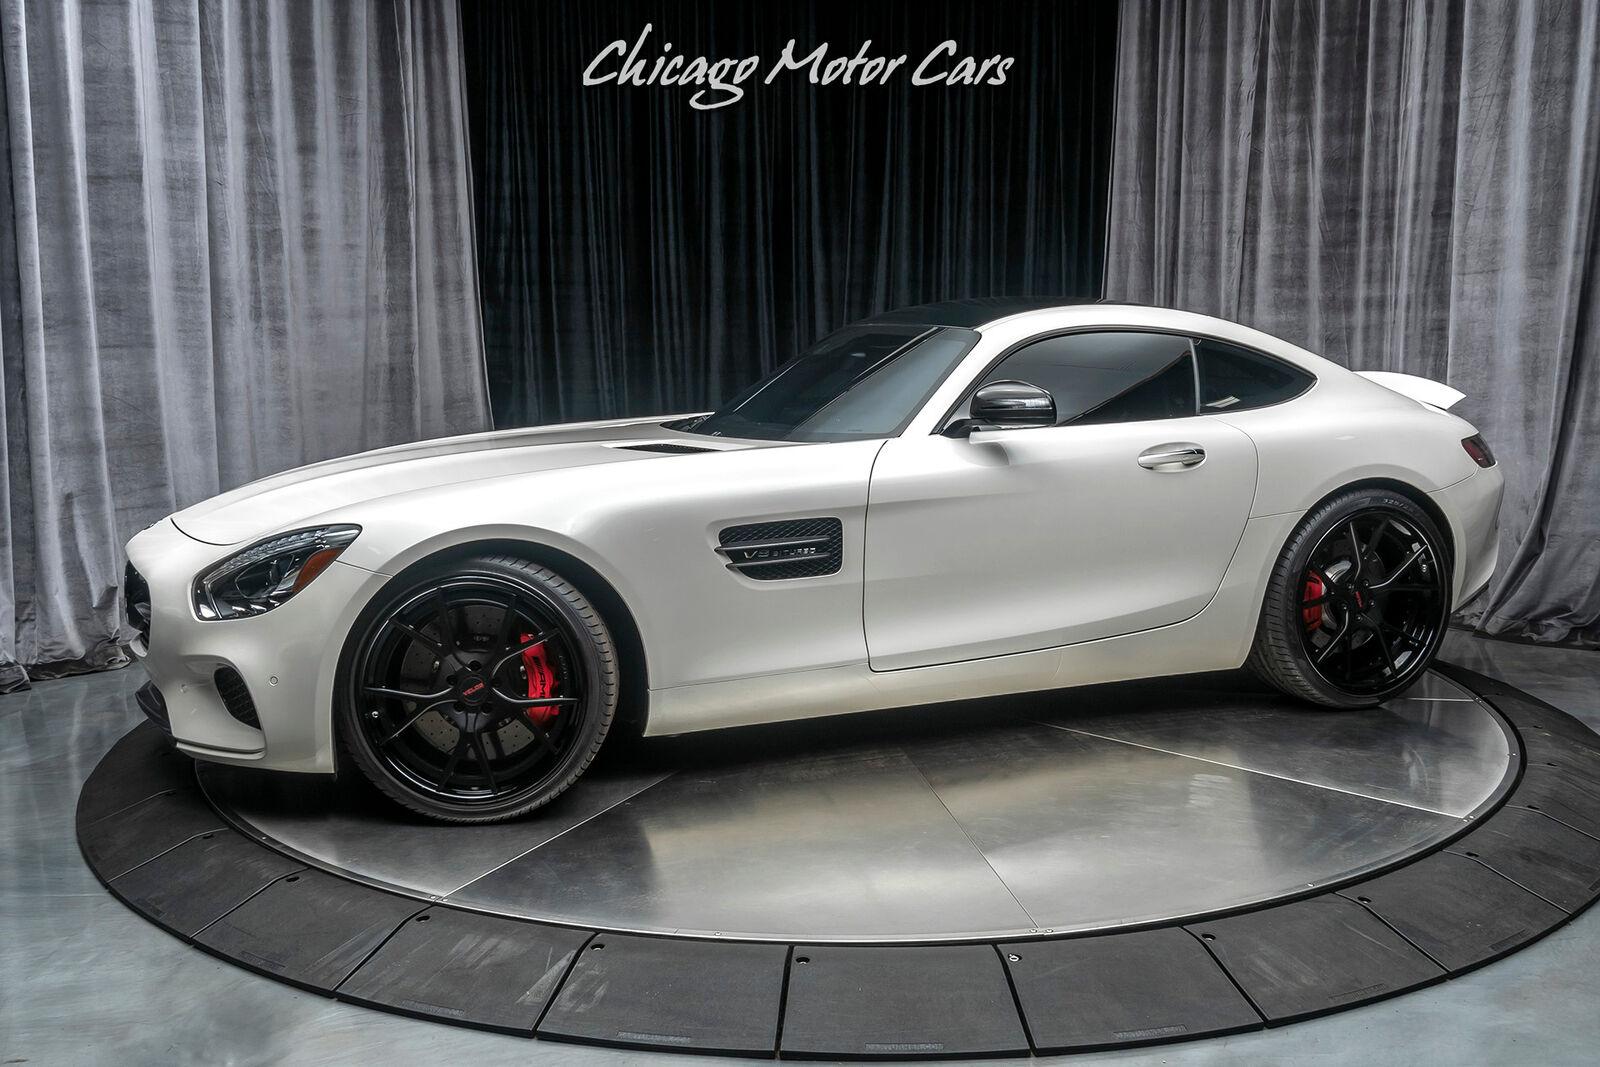 used Mercedes-Benz GT AMG 2016 vin: WDDYJ7JA4GA006782